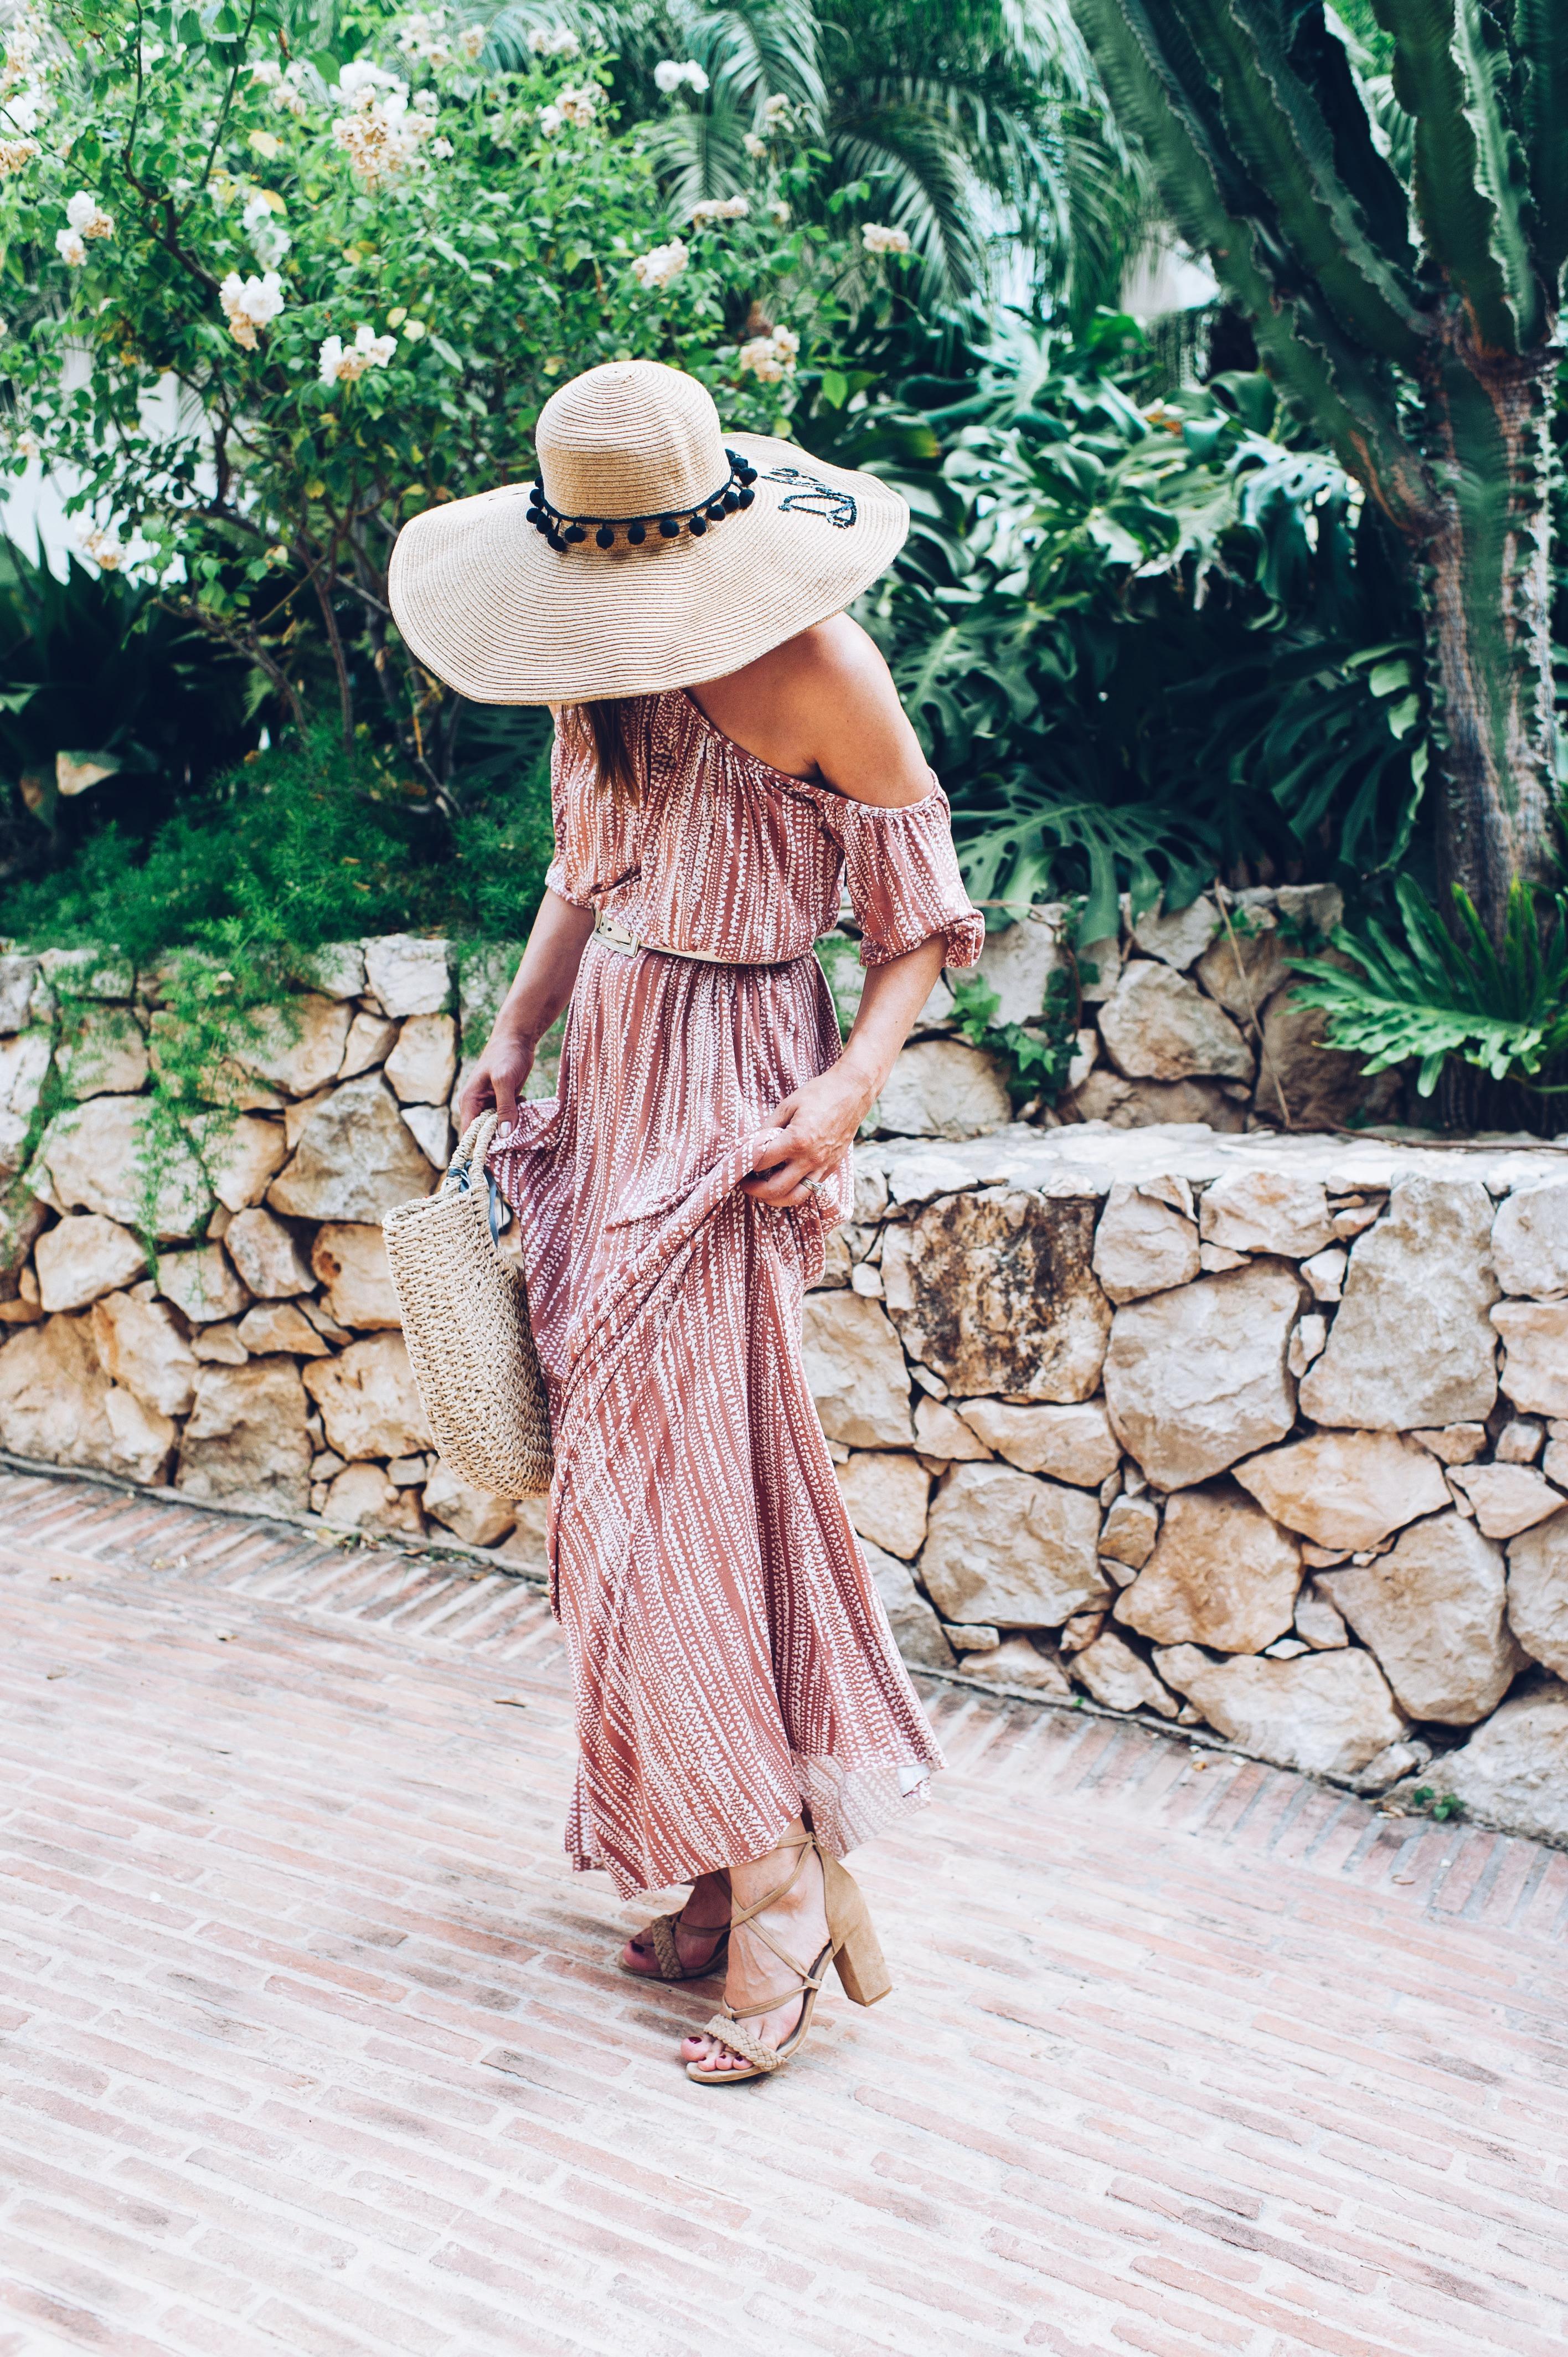 Rachel Pally summer dress, Raye heels, personalised hat